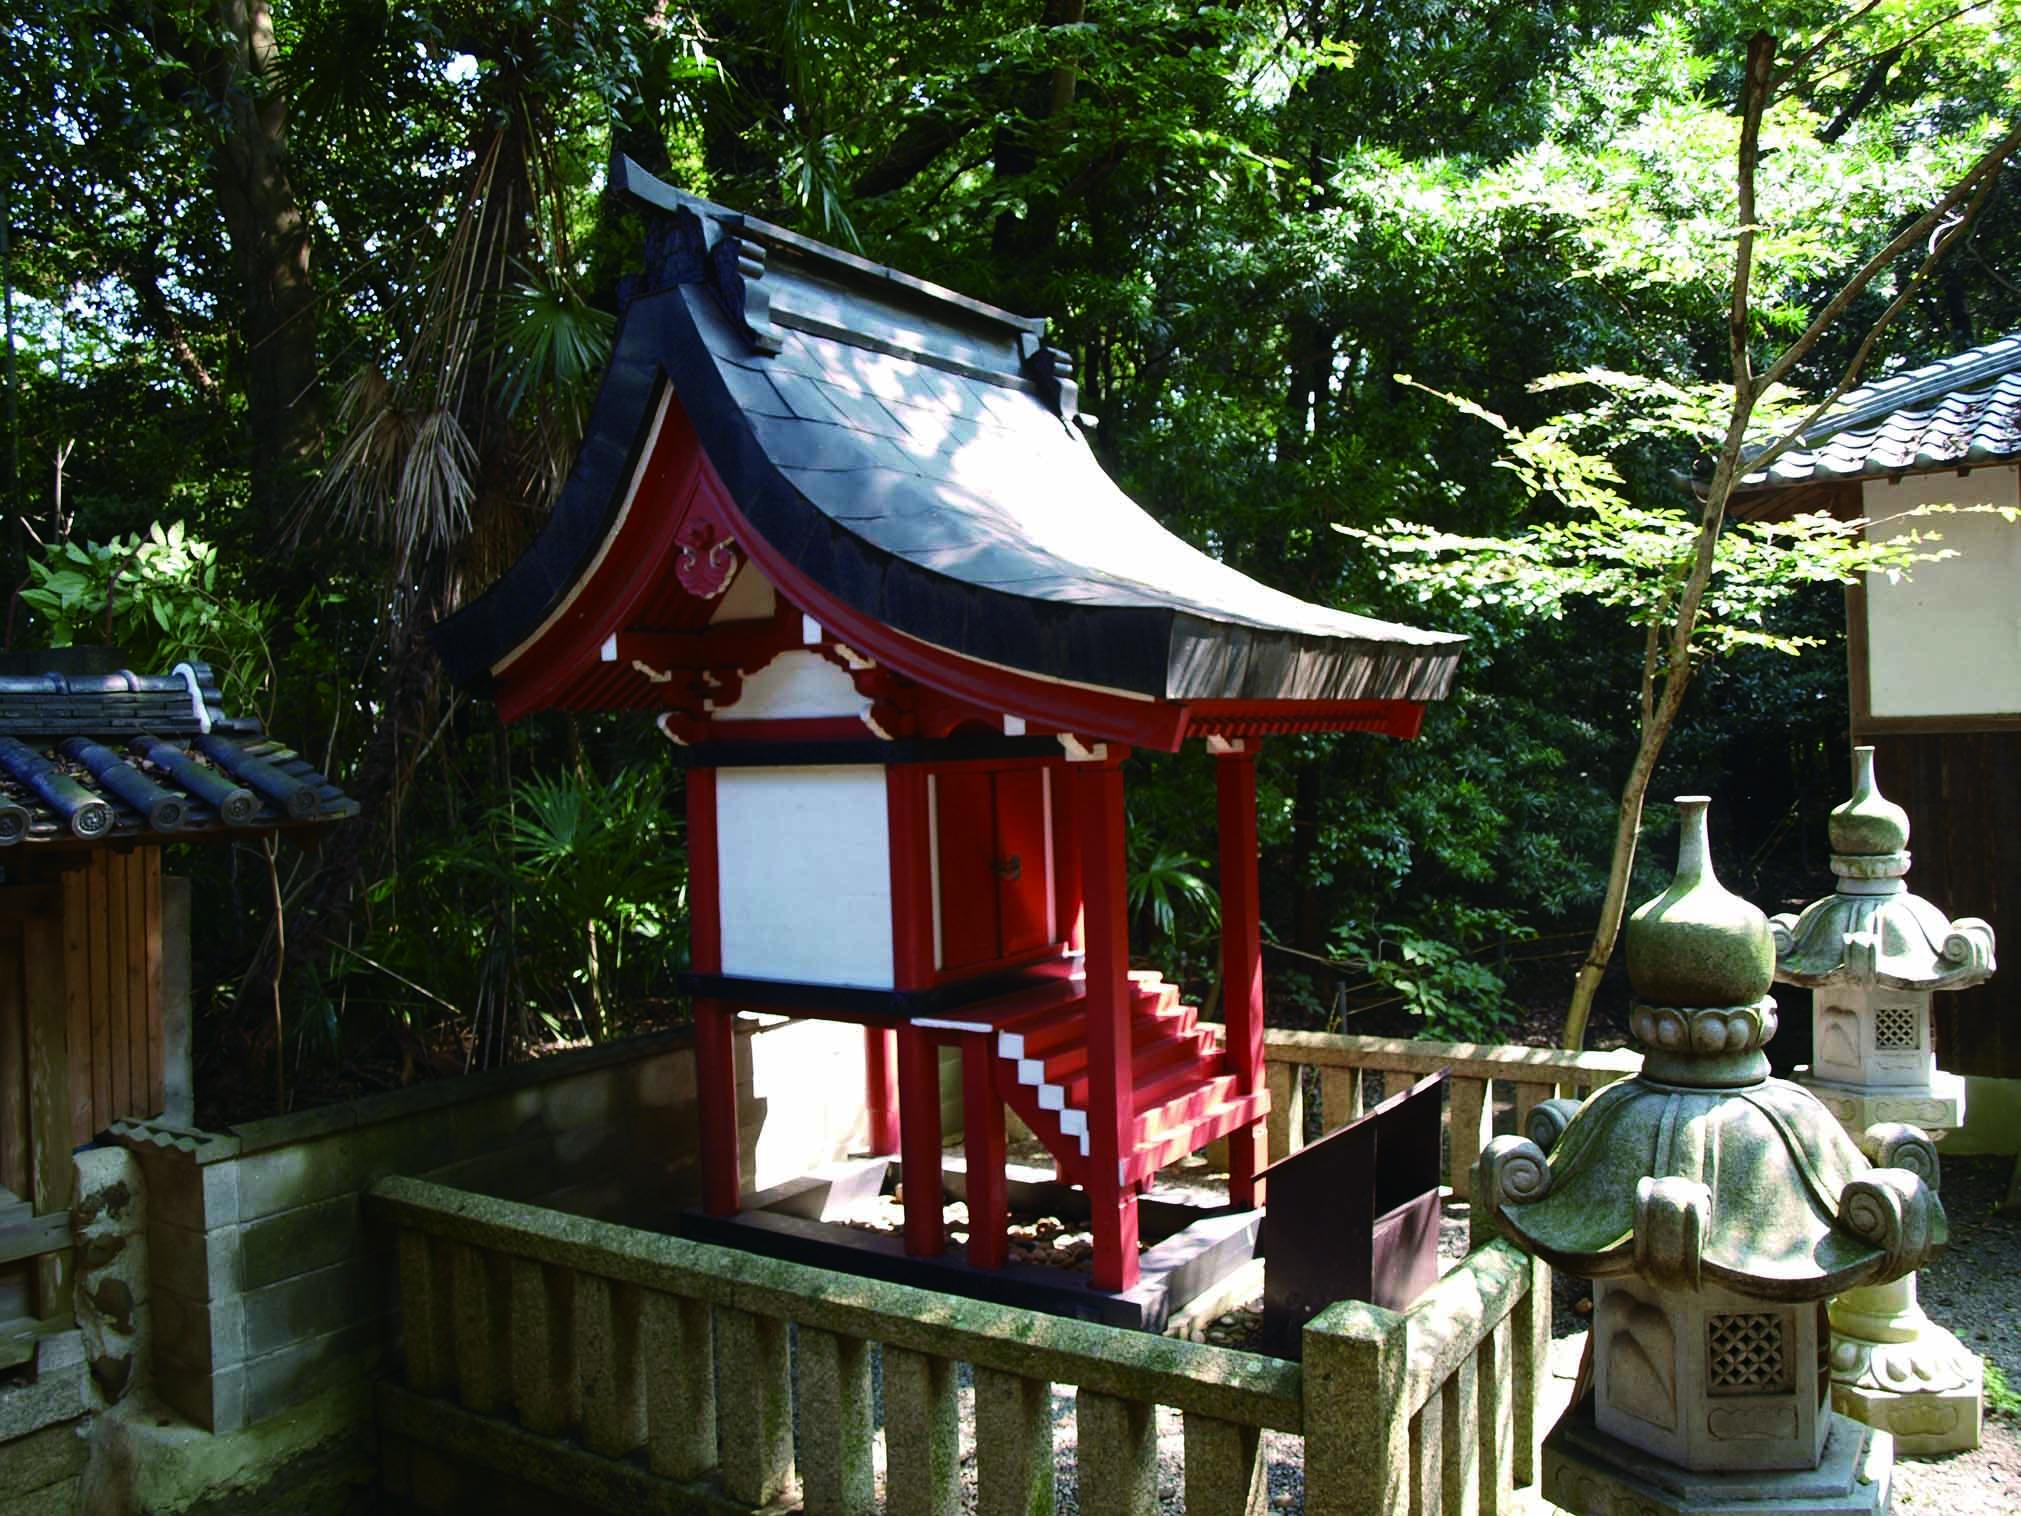 <p>一間社流造の若宮神社本殿</p>17世紀中頃に建てられた五間社流造の本社本殿と、この摂社若宮神社本殿はともに大阪府指定文化財である。